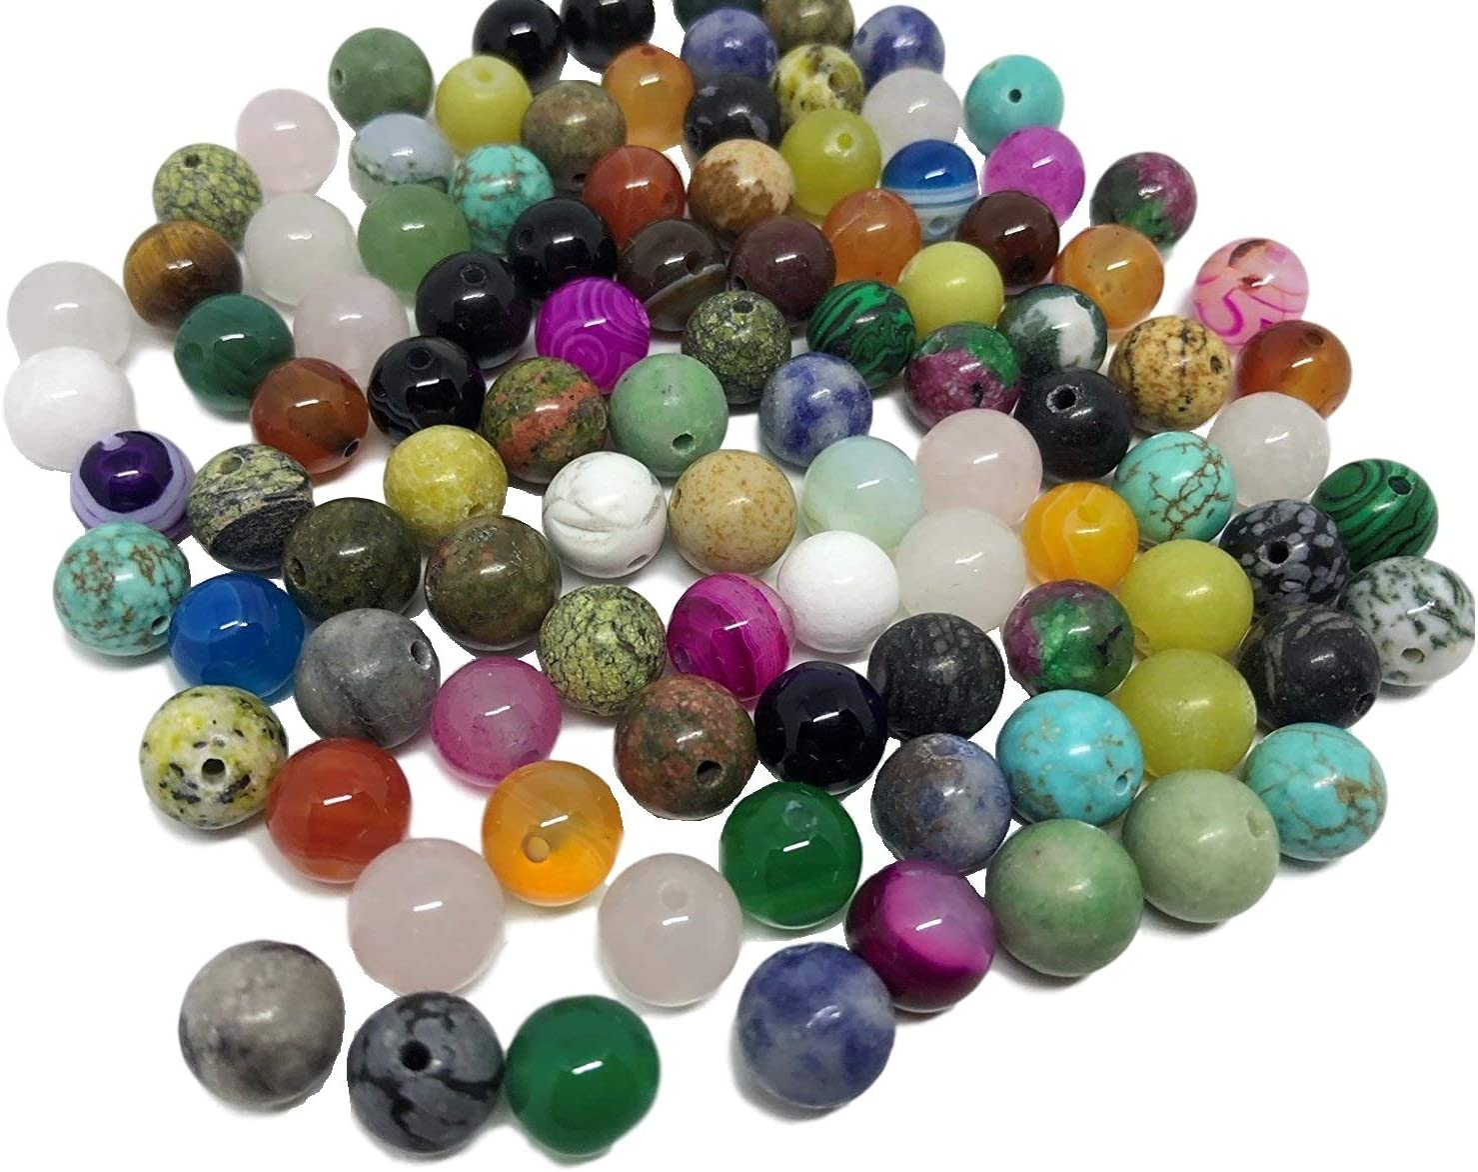 100 unidades de piedras semipreciosas variadas, para joyería, manualidades, obsidiana, aventurina, jade, ónix, ojo de tigre, malaquita, turquesa, cuarzo, cuarzo rosa, etc.